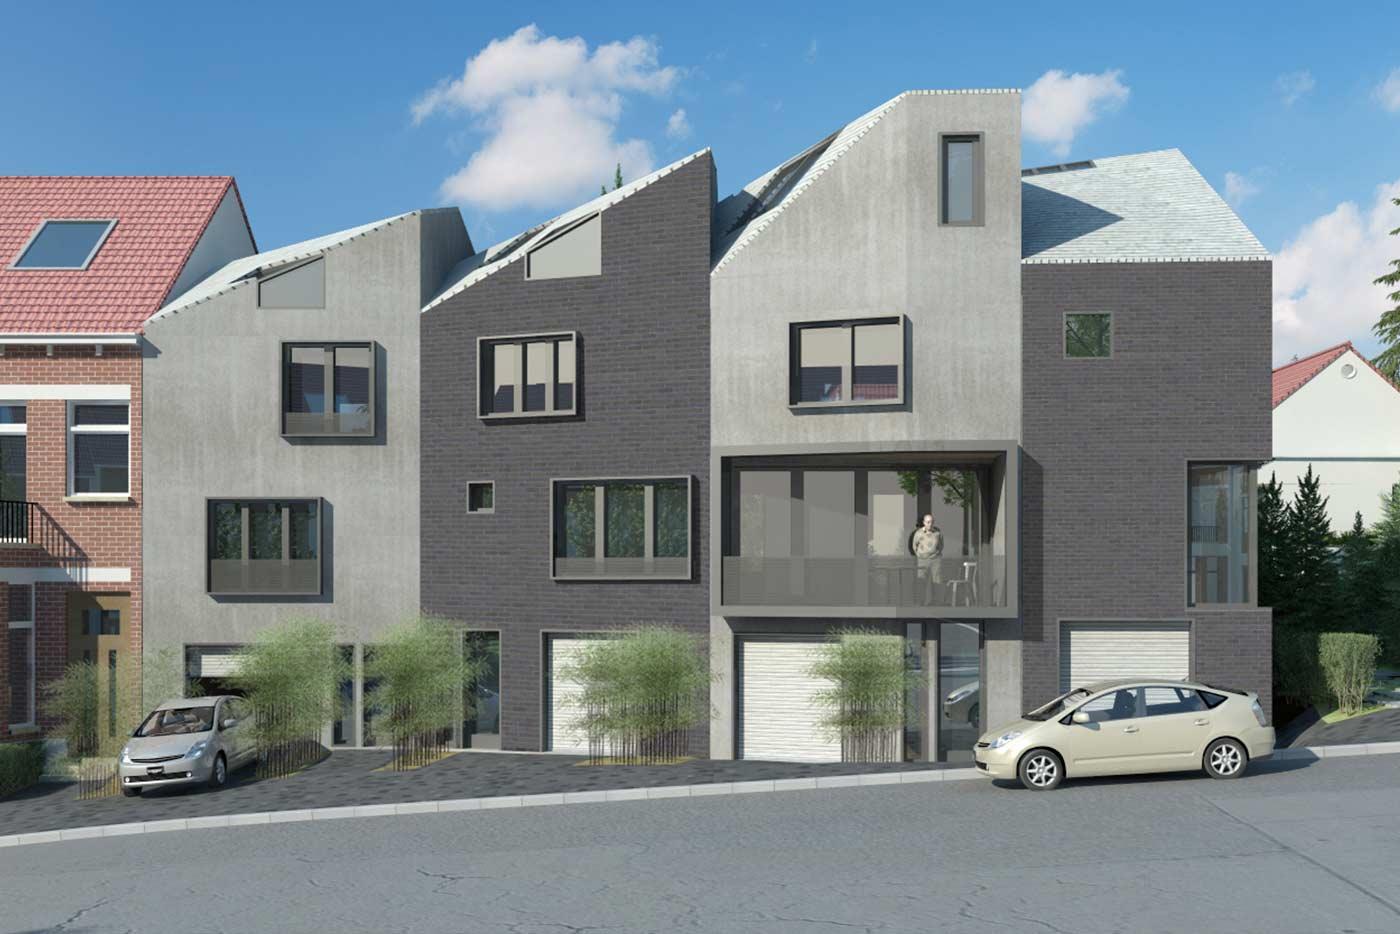 exceland copropri t bear architectes agence architecture jeremy biermann. Black Bedroom Furniture Sets. Home Design Ideas